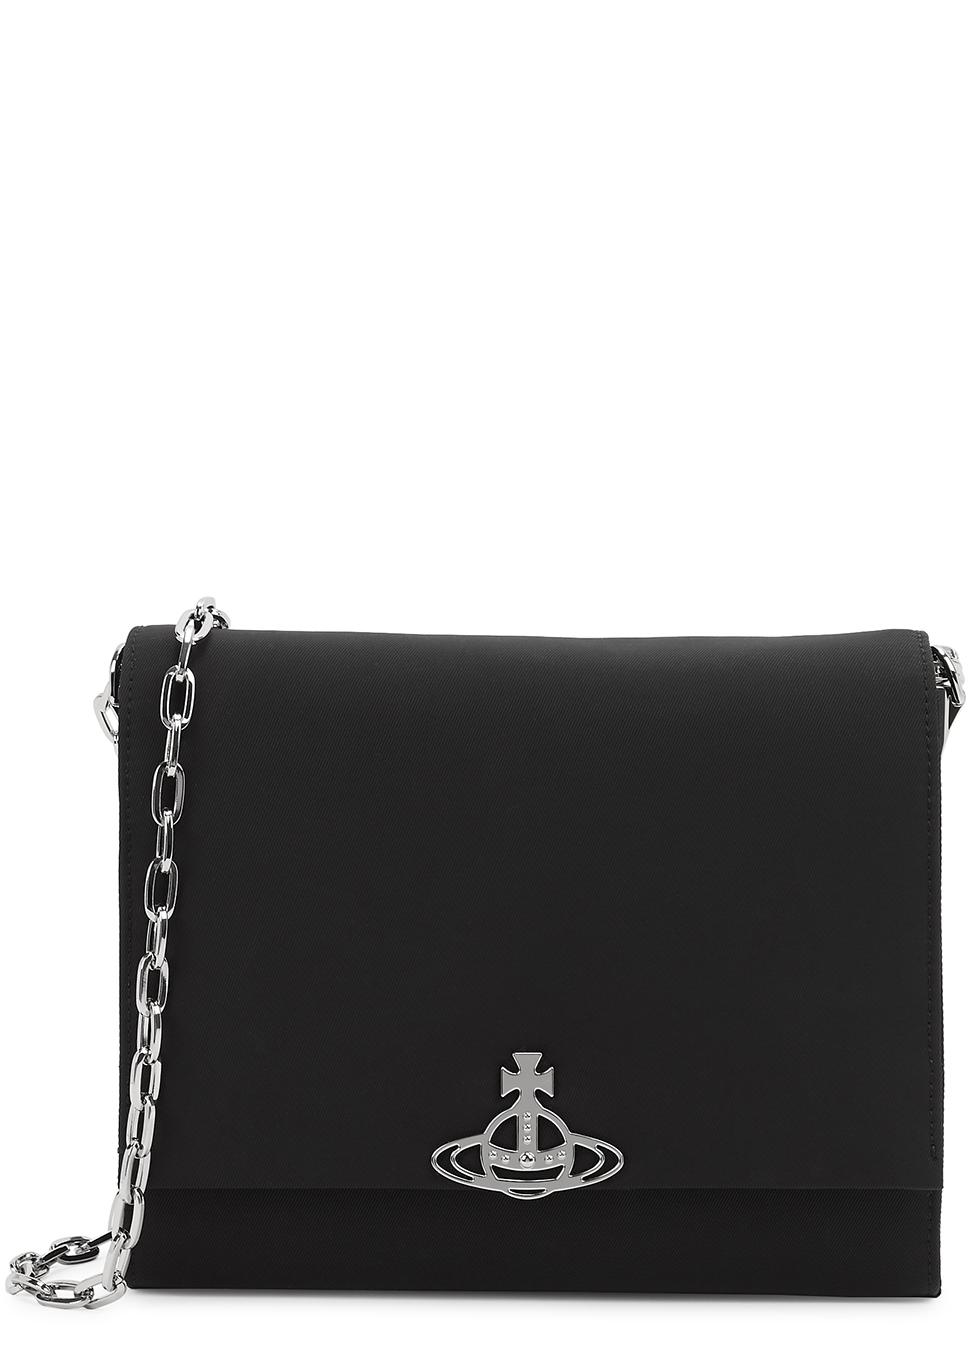 Hilary medium black nylon cross-body bag